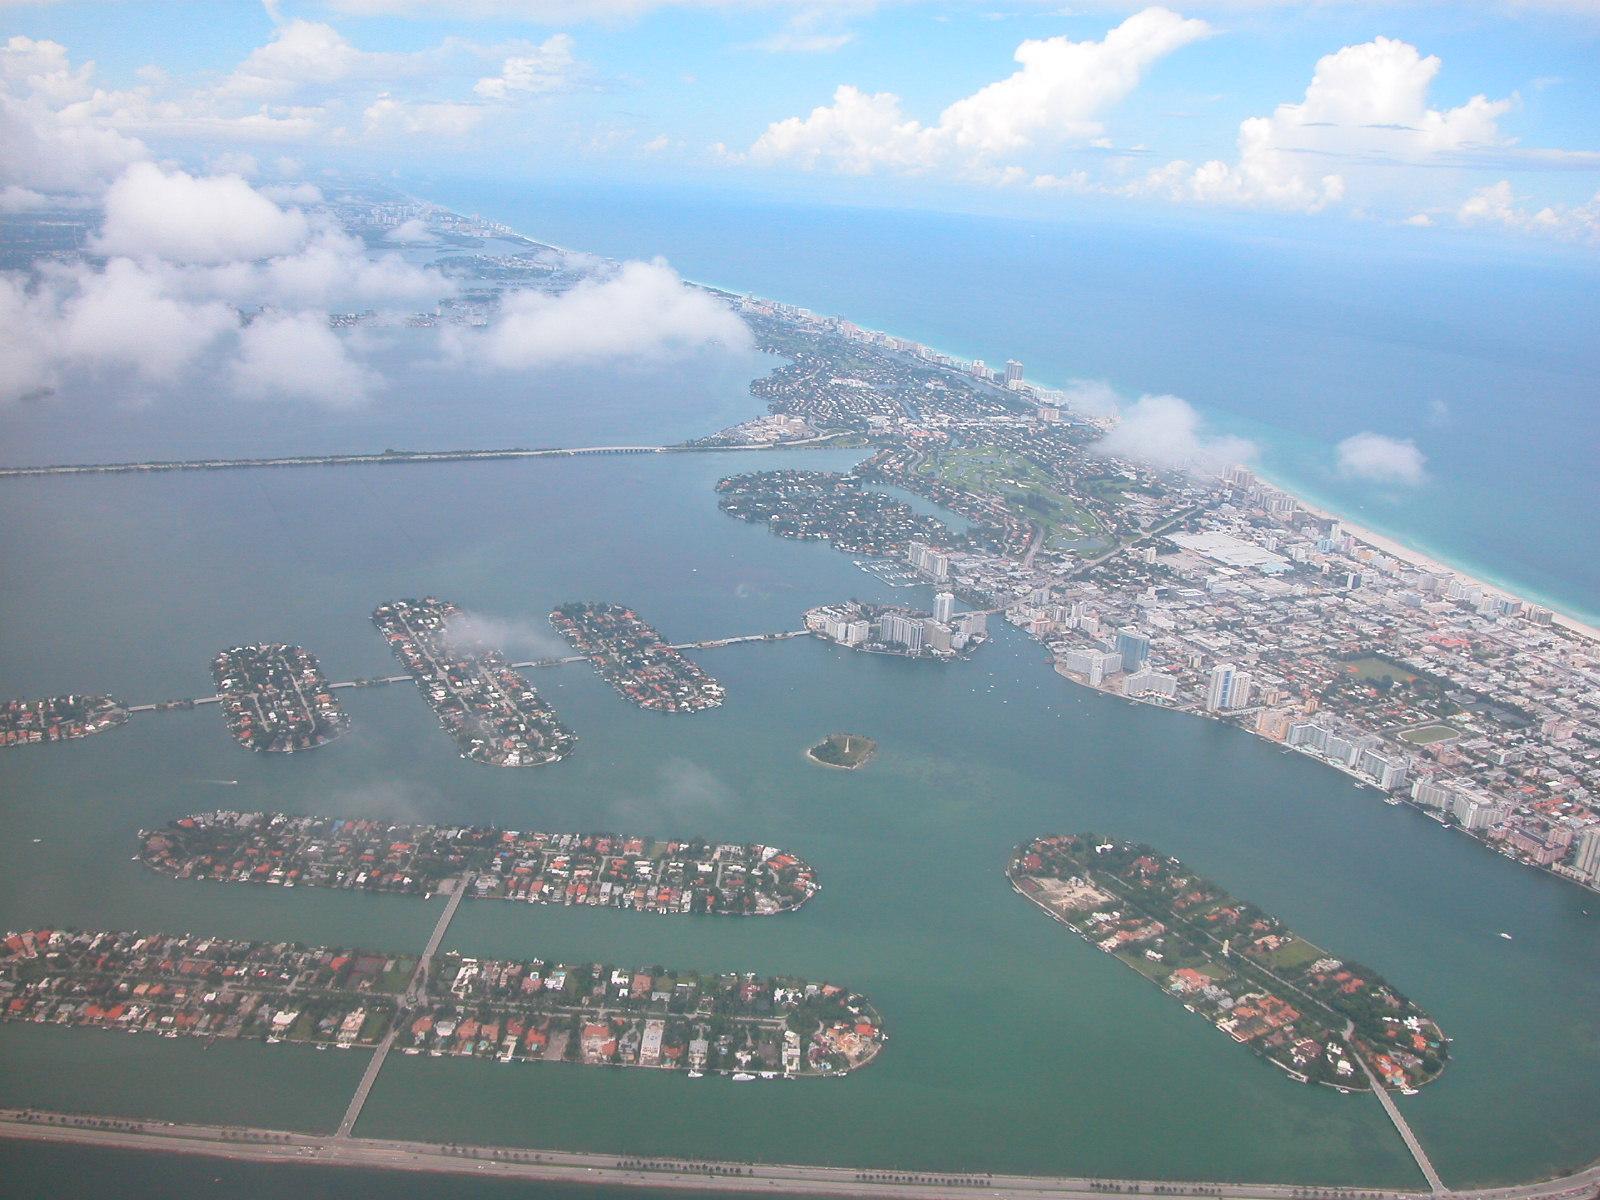 jacco curacao city cityscape aerial florida